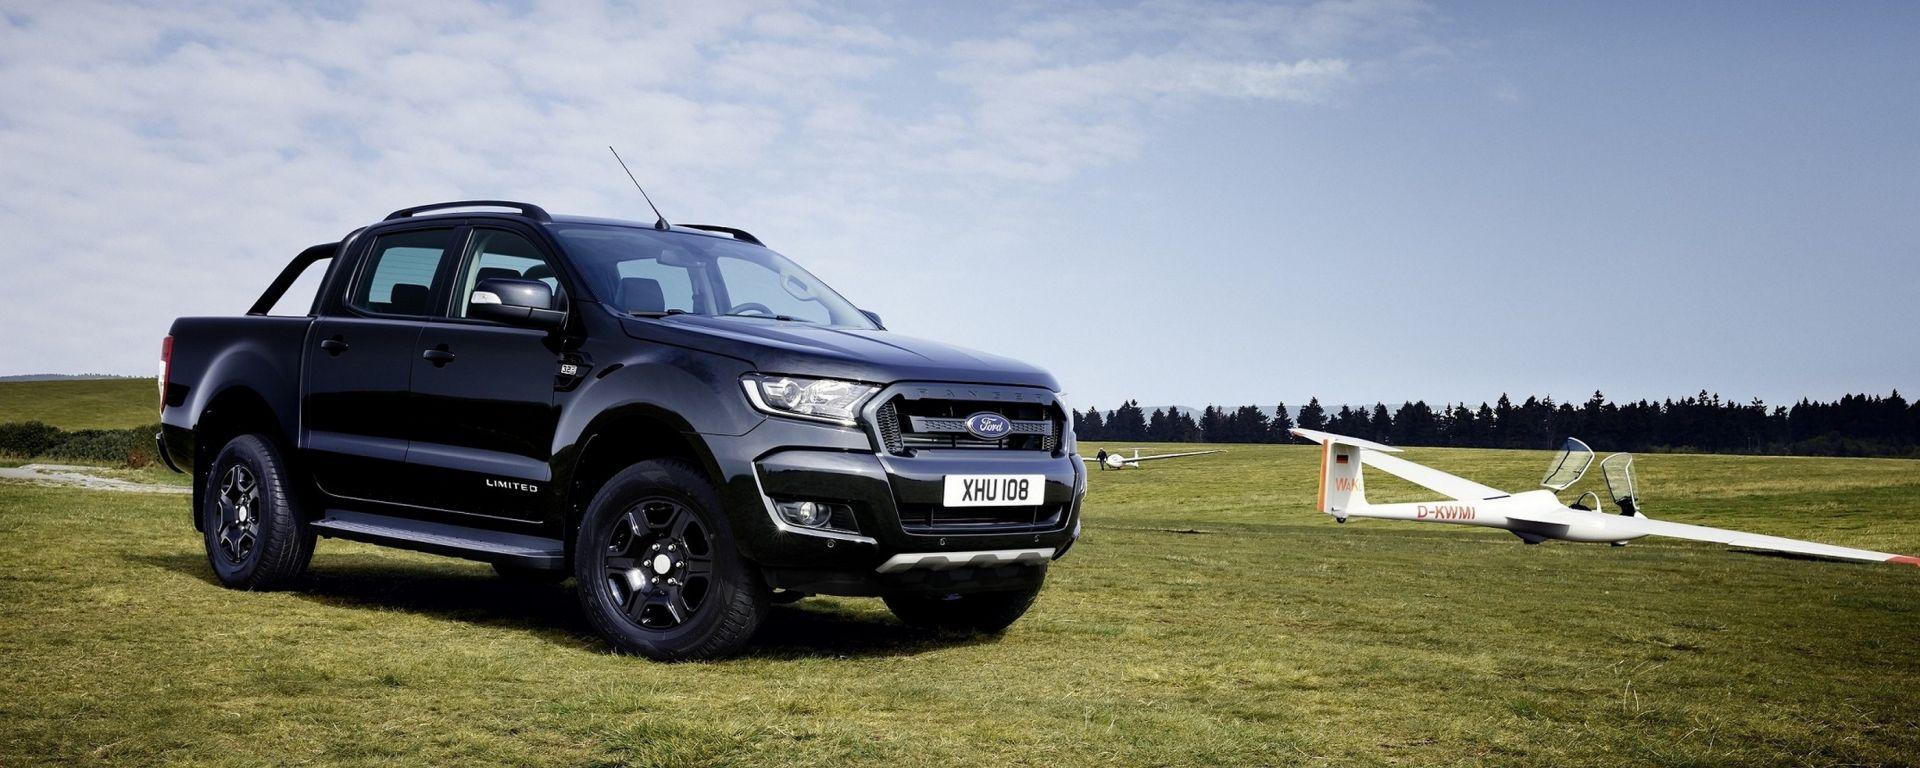 Ford Ranger Black Edition, serie speciale per Francoforte